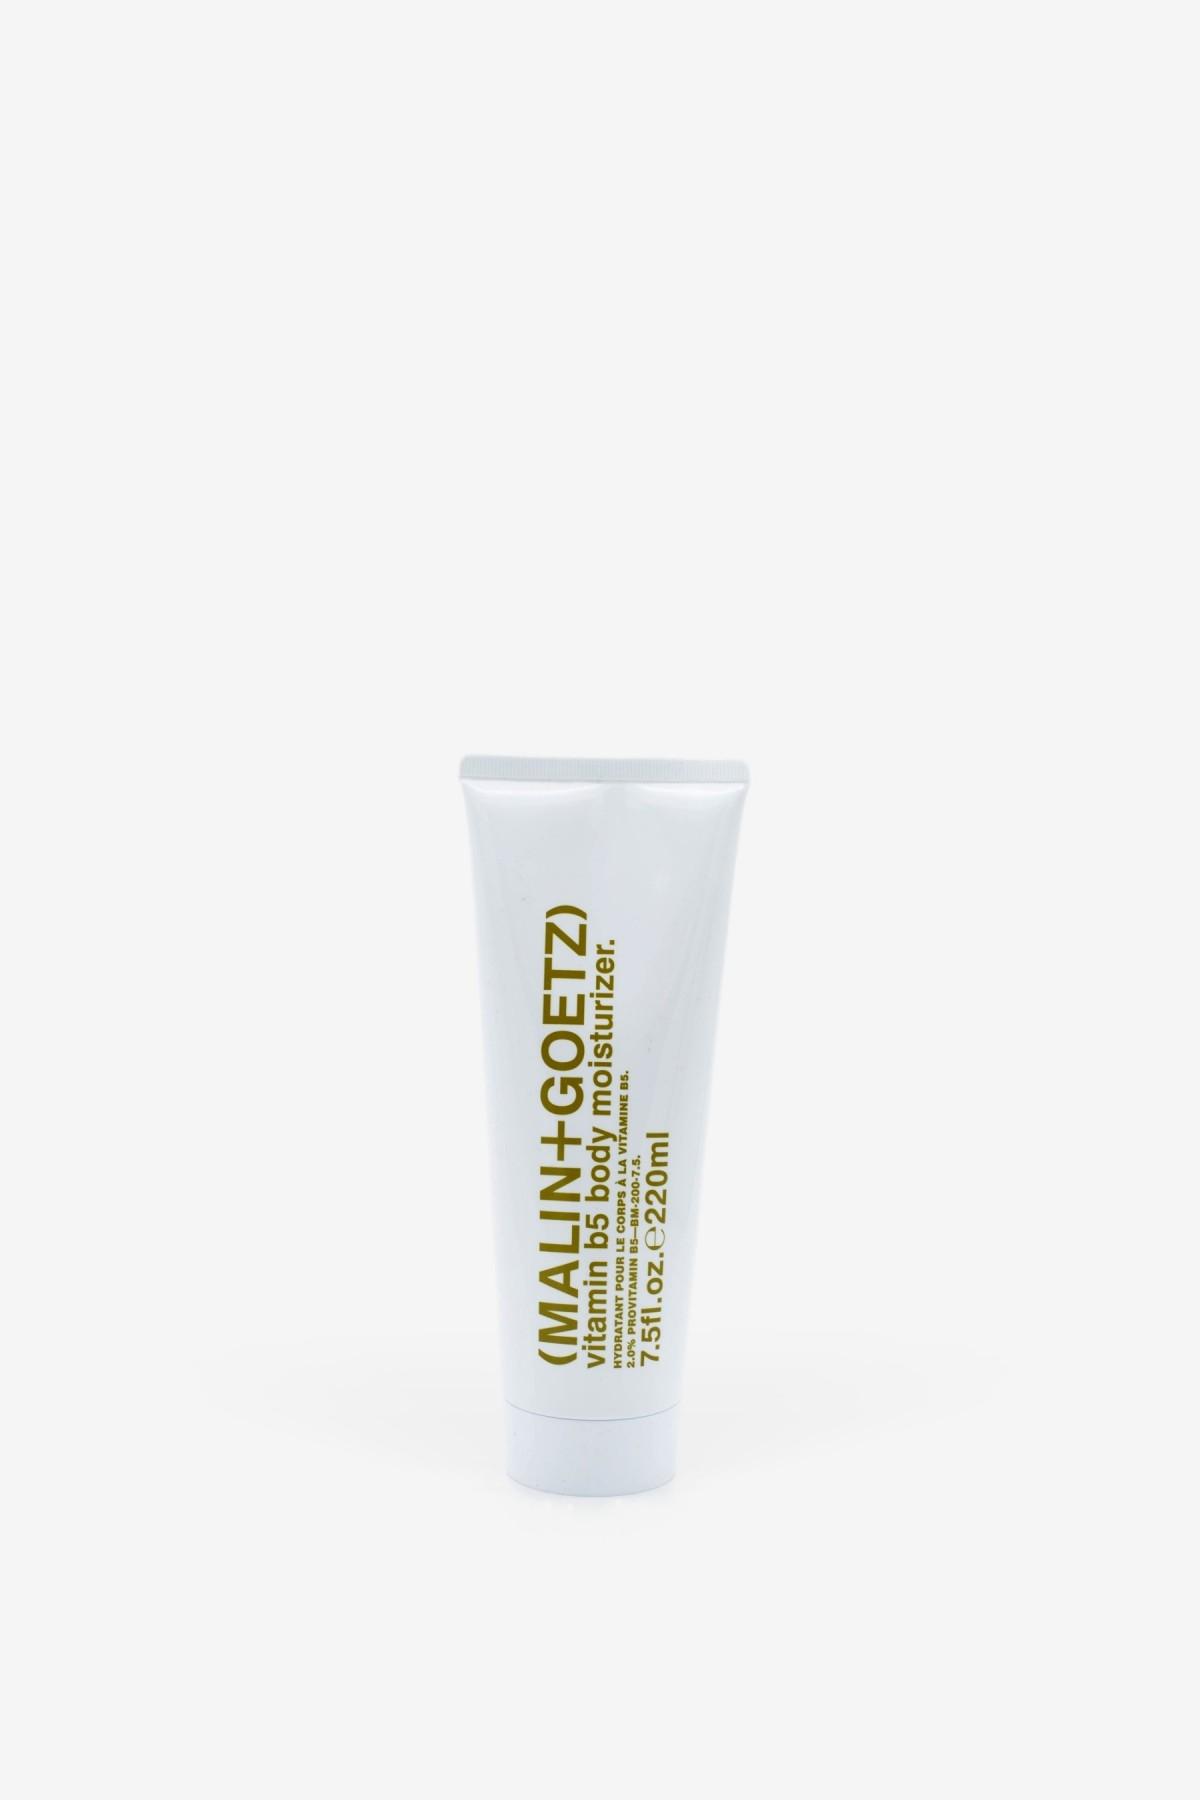 Malin+Goetz Vitamin B5 Body Moisturizer 220ml in